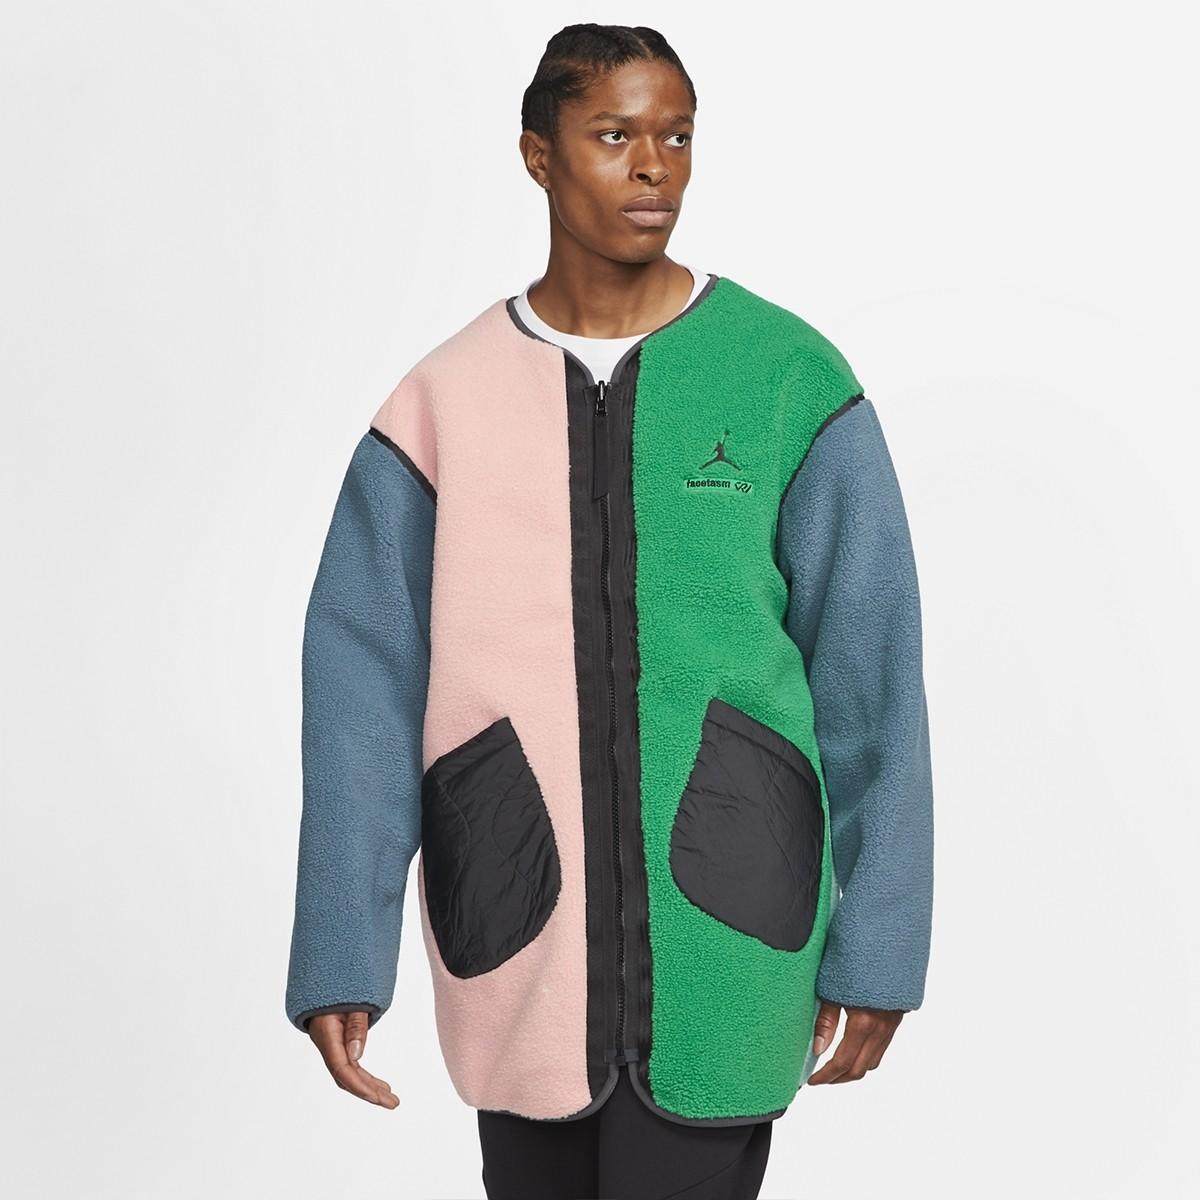 Chaqueta Jordan x Facetasm Why Not Reverse 'Black Multicolor'